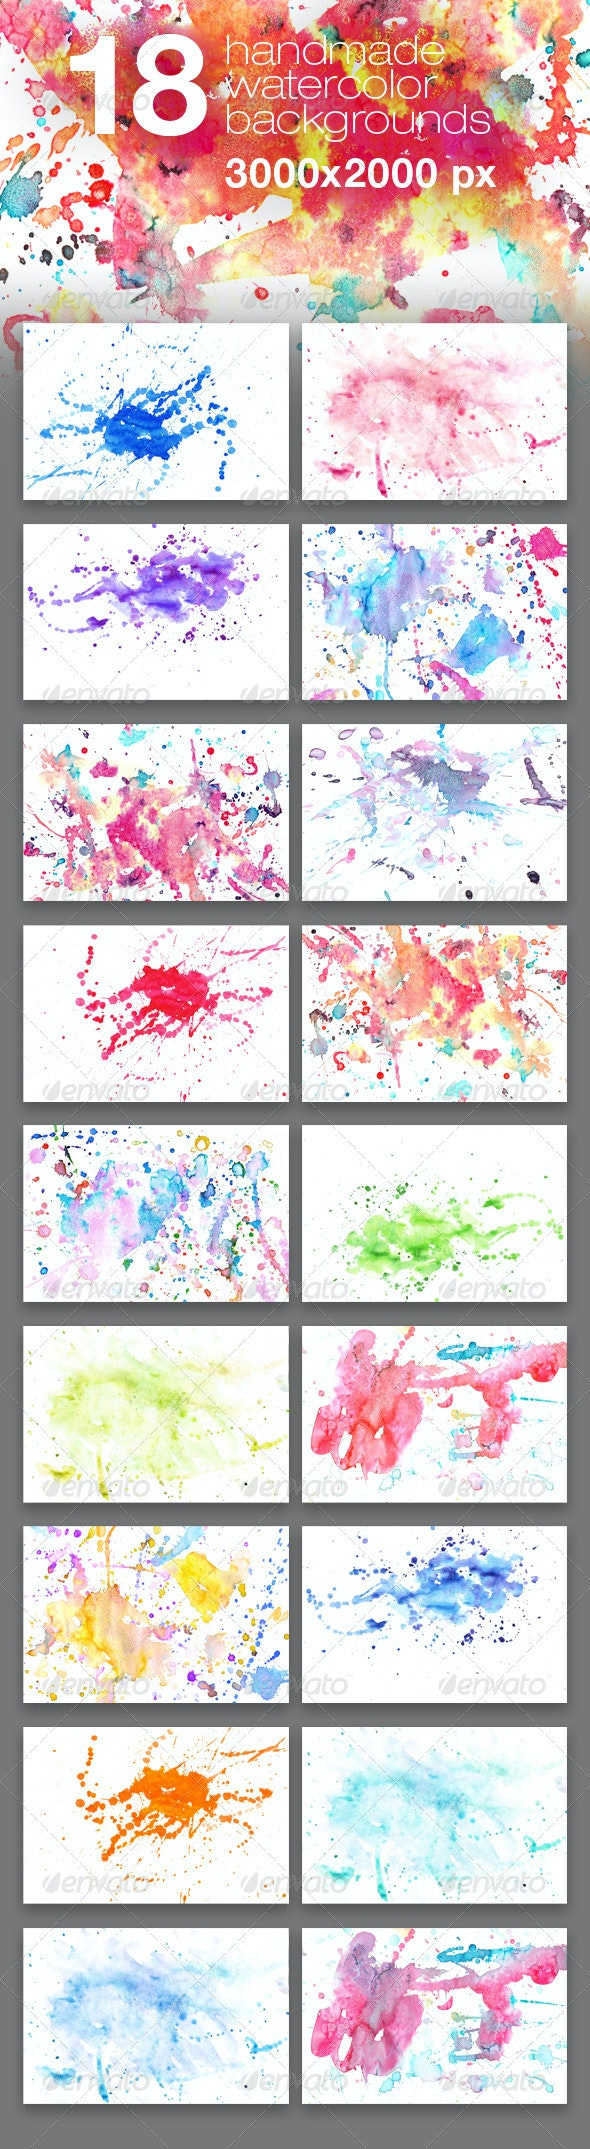 18 Handmade Watercolor Texture Backgrounds - Miscellaneous Textures